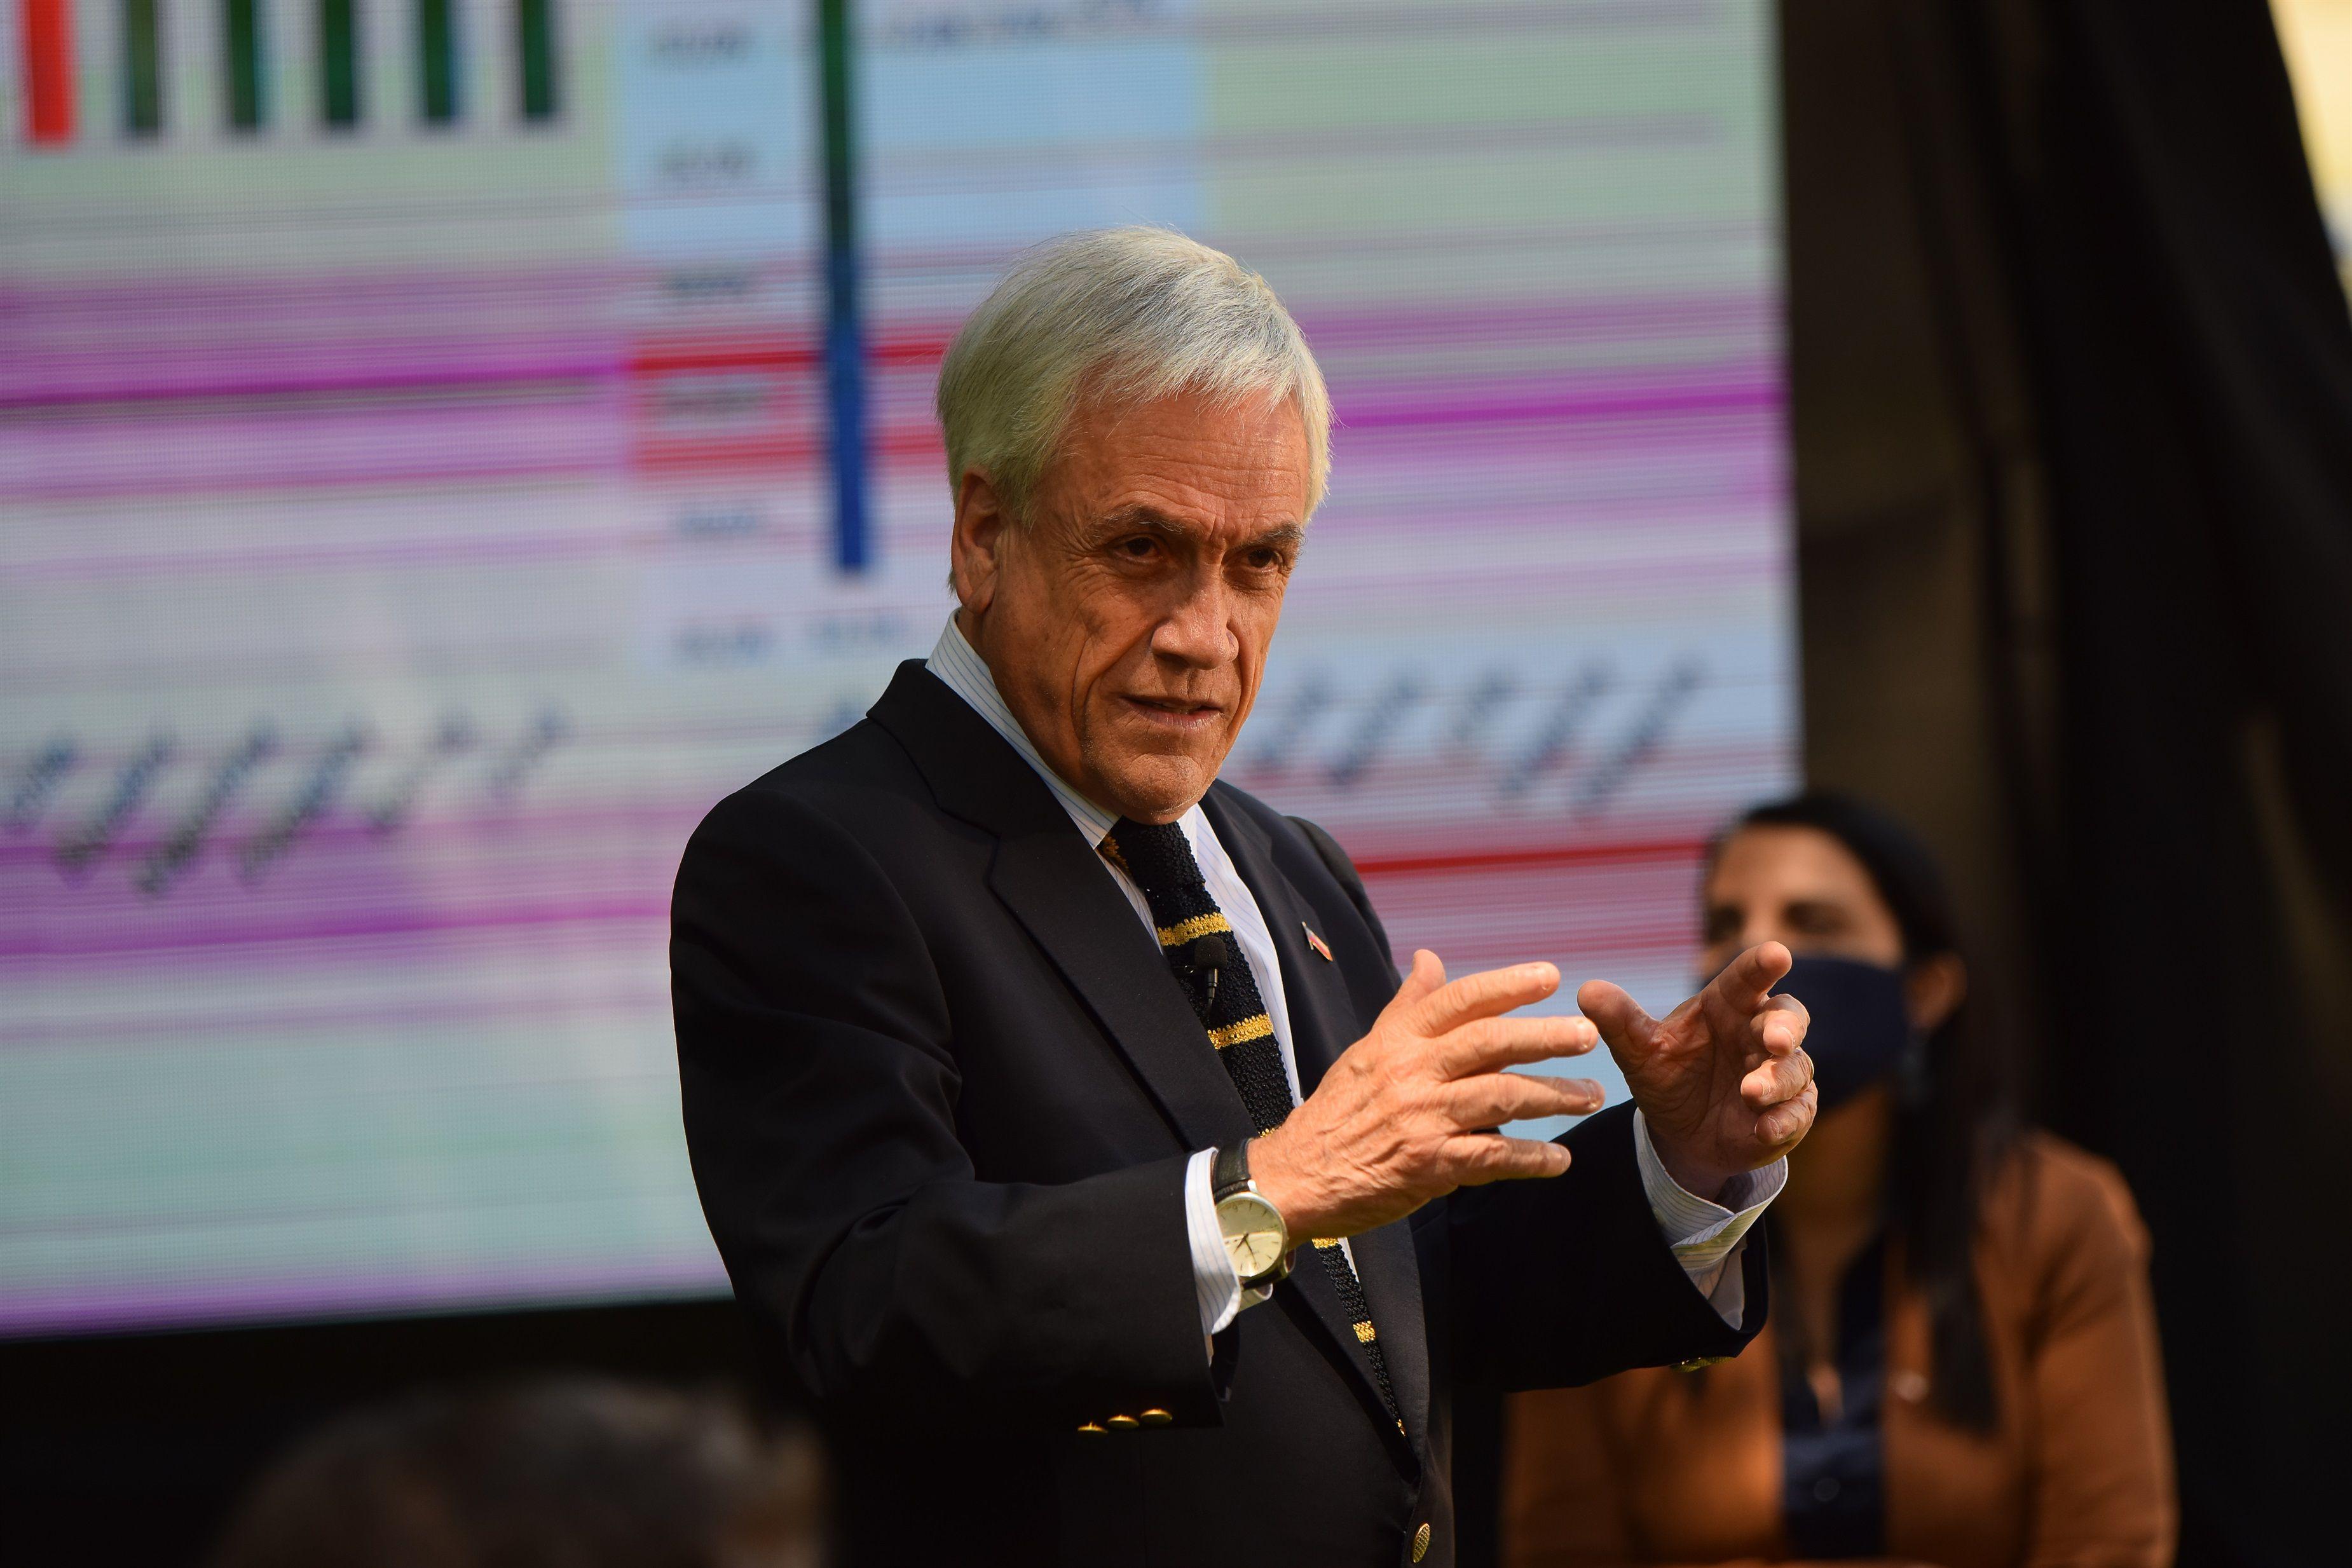 10-11-2020 Sebastián Piñera, presidente de Chile POLITICA SUDAMÉRICA INTERNACIONAL CHILE AGENCIAUNO / PABLO OVALLE ISASMENDI